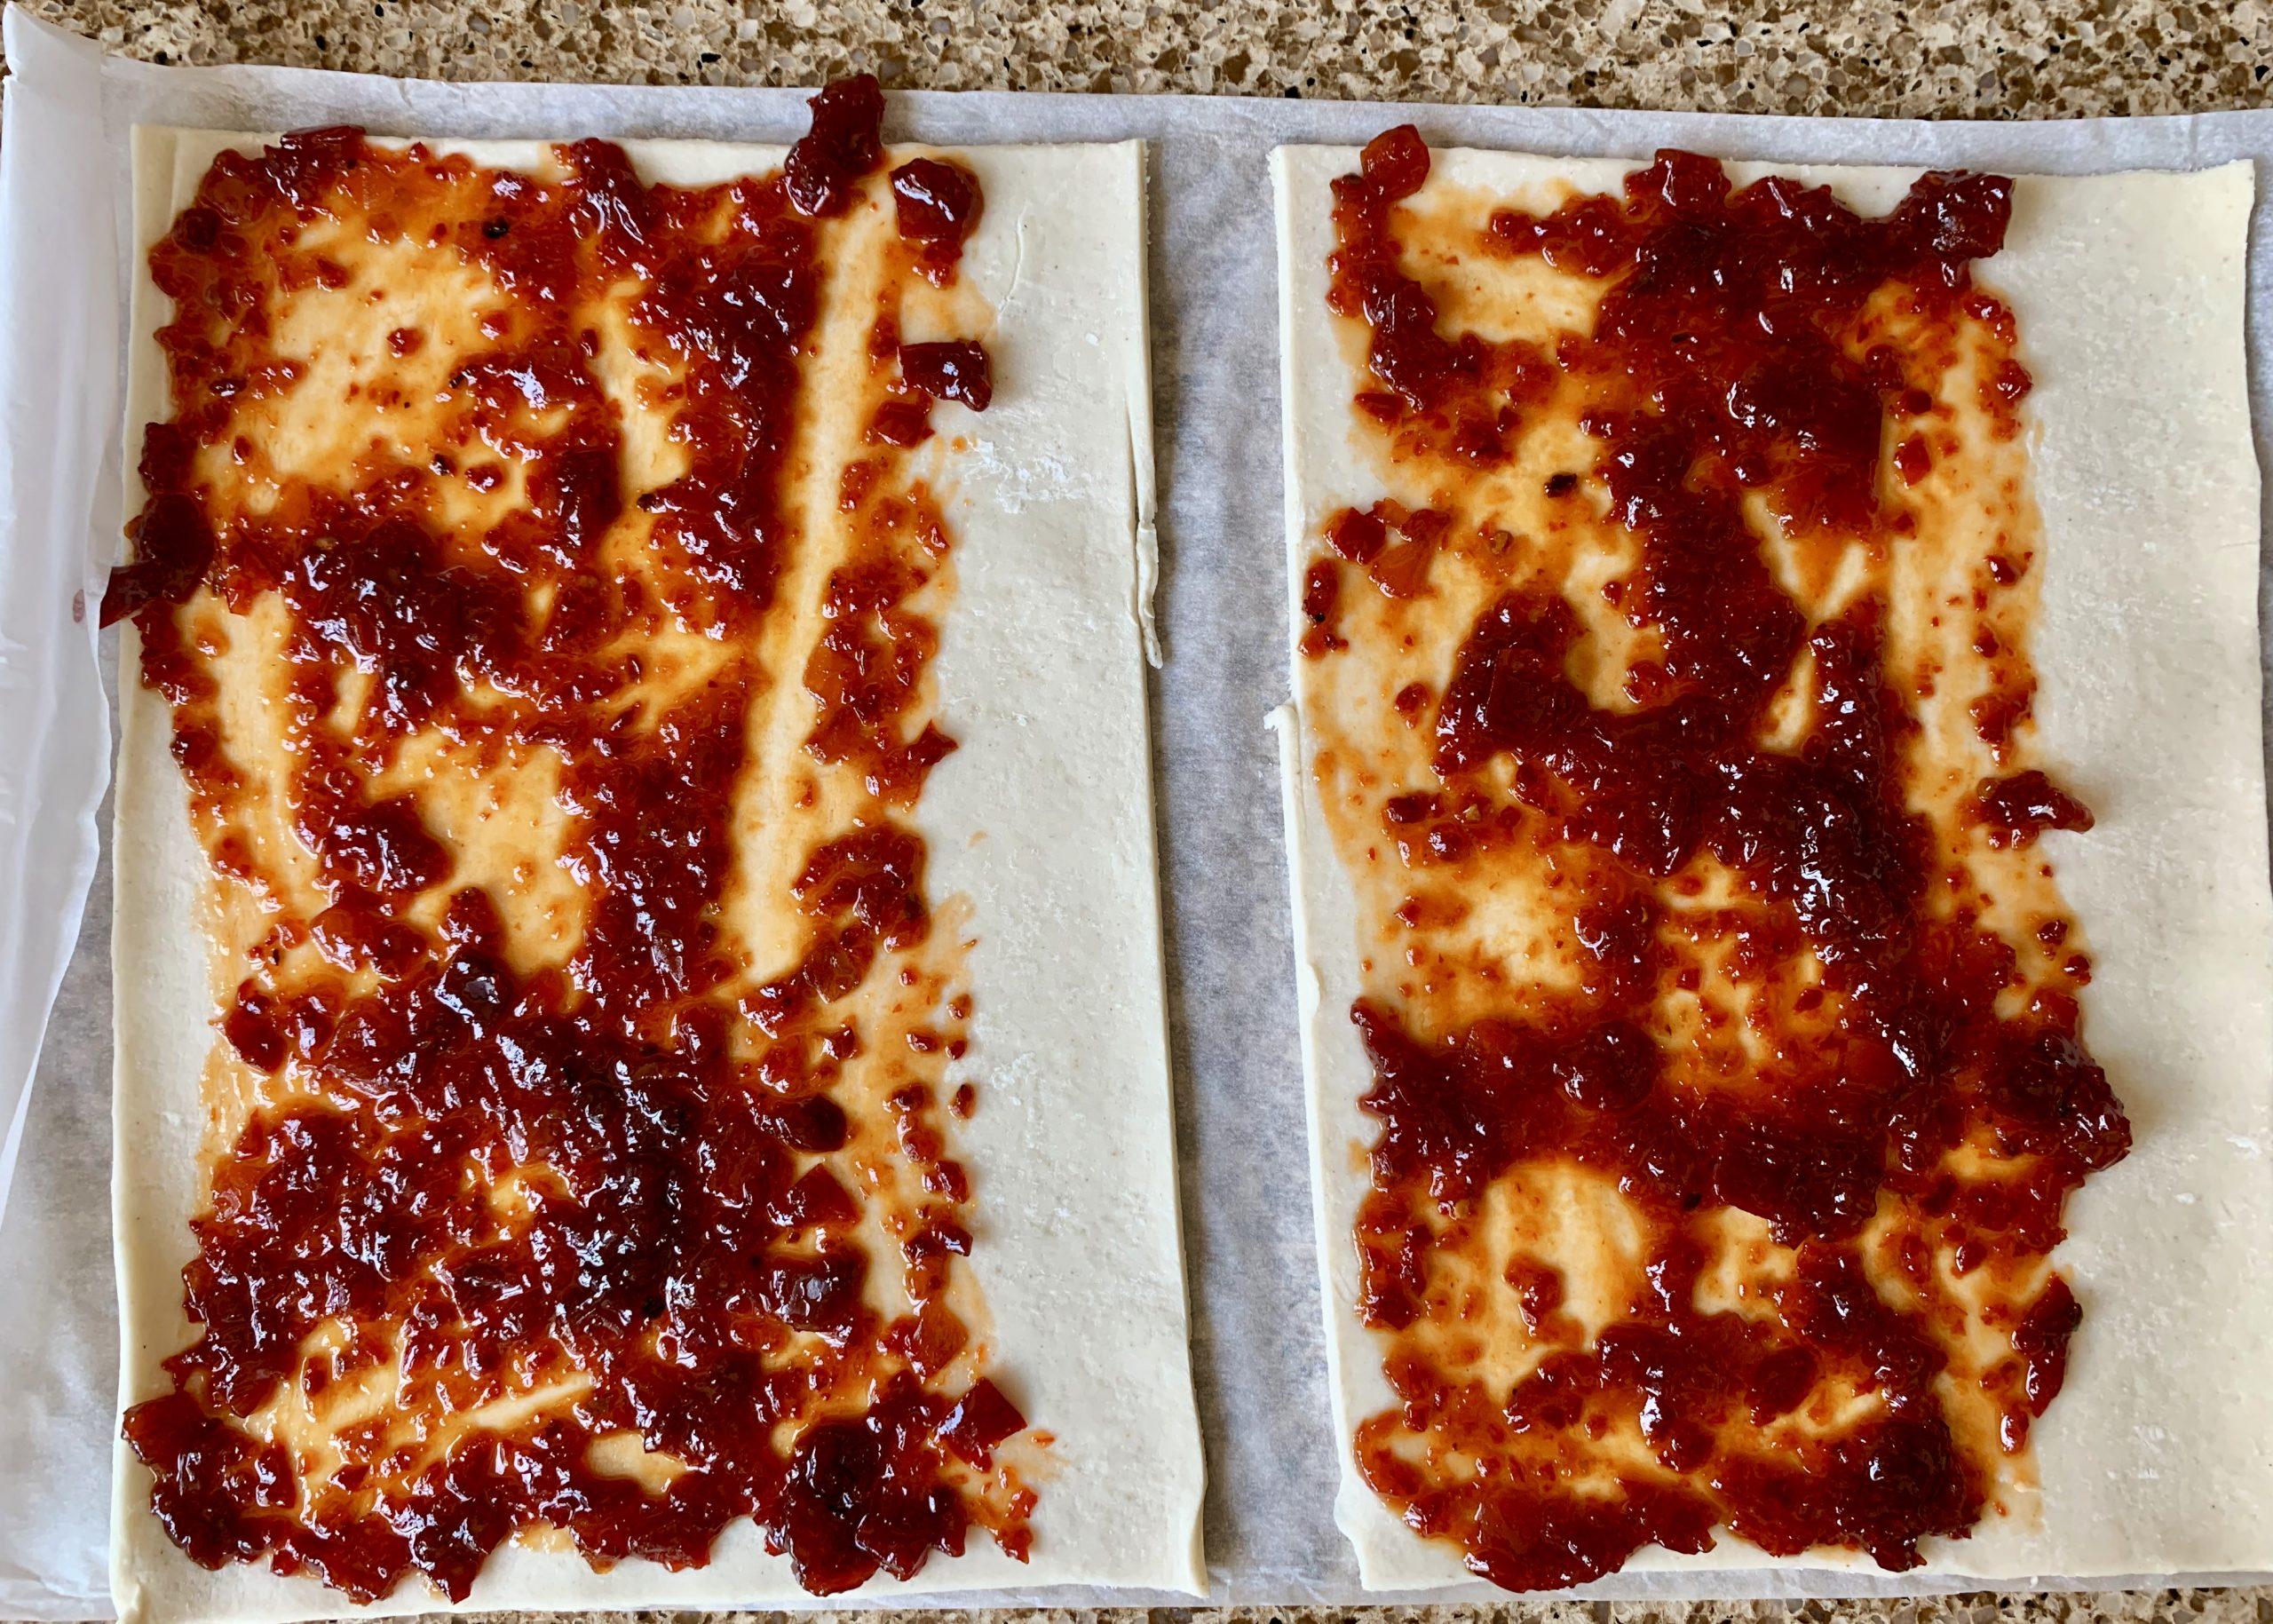 Chilli jam on gluten free puff pastry